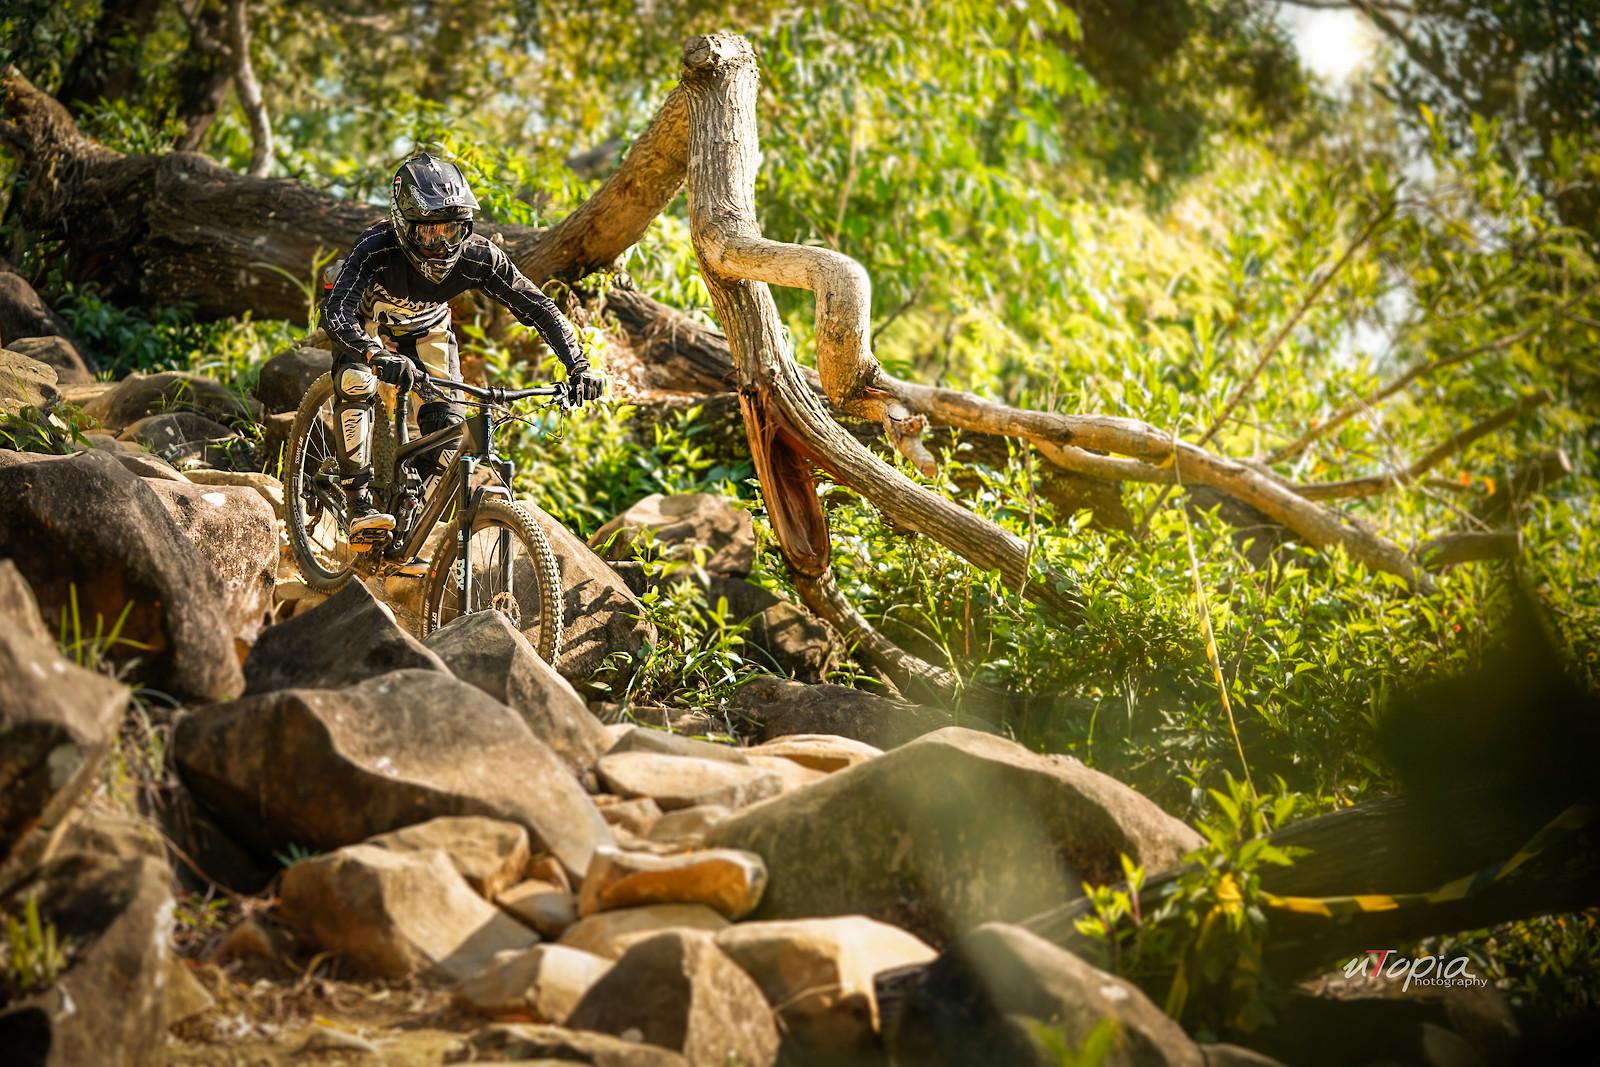 The Rock - utopiaarch - Mountain Biking Pictures - Vital MTB